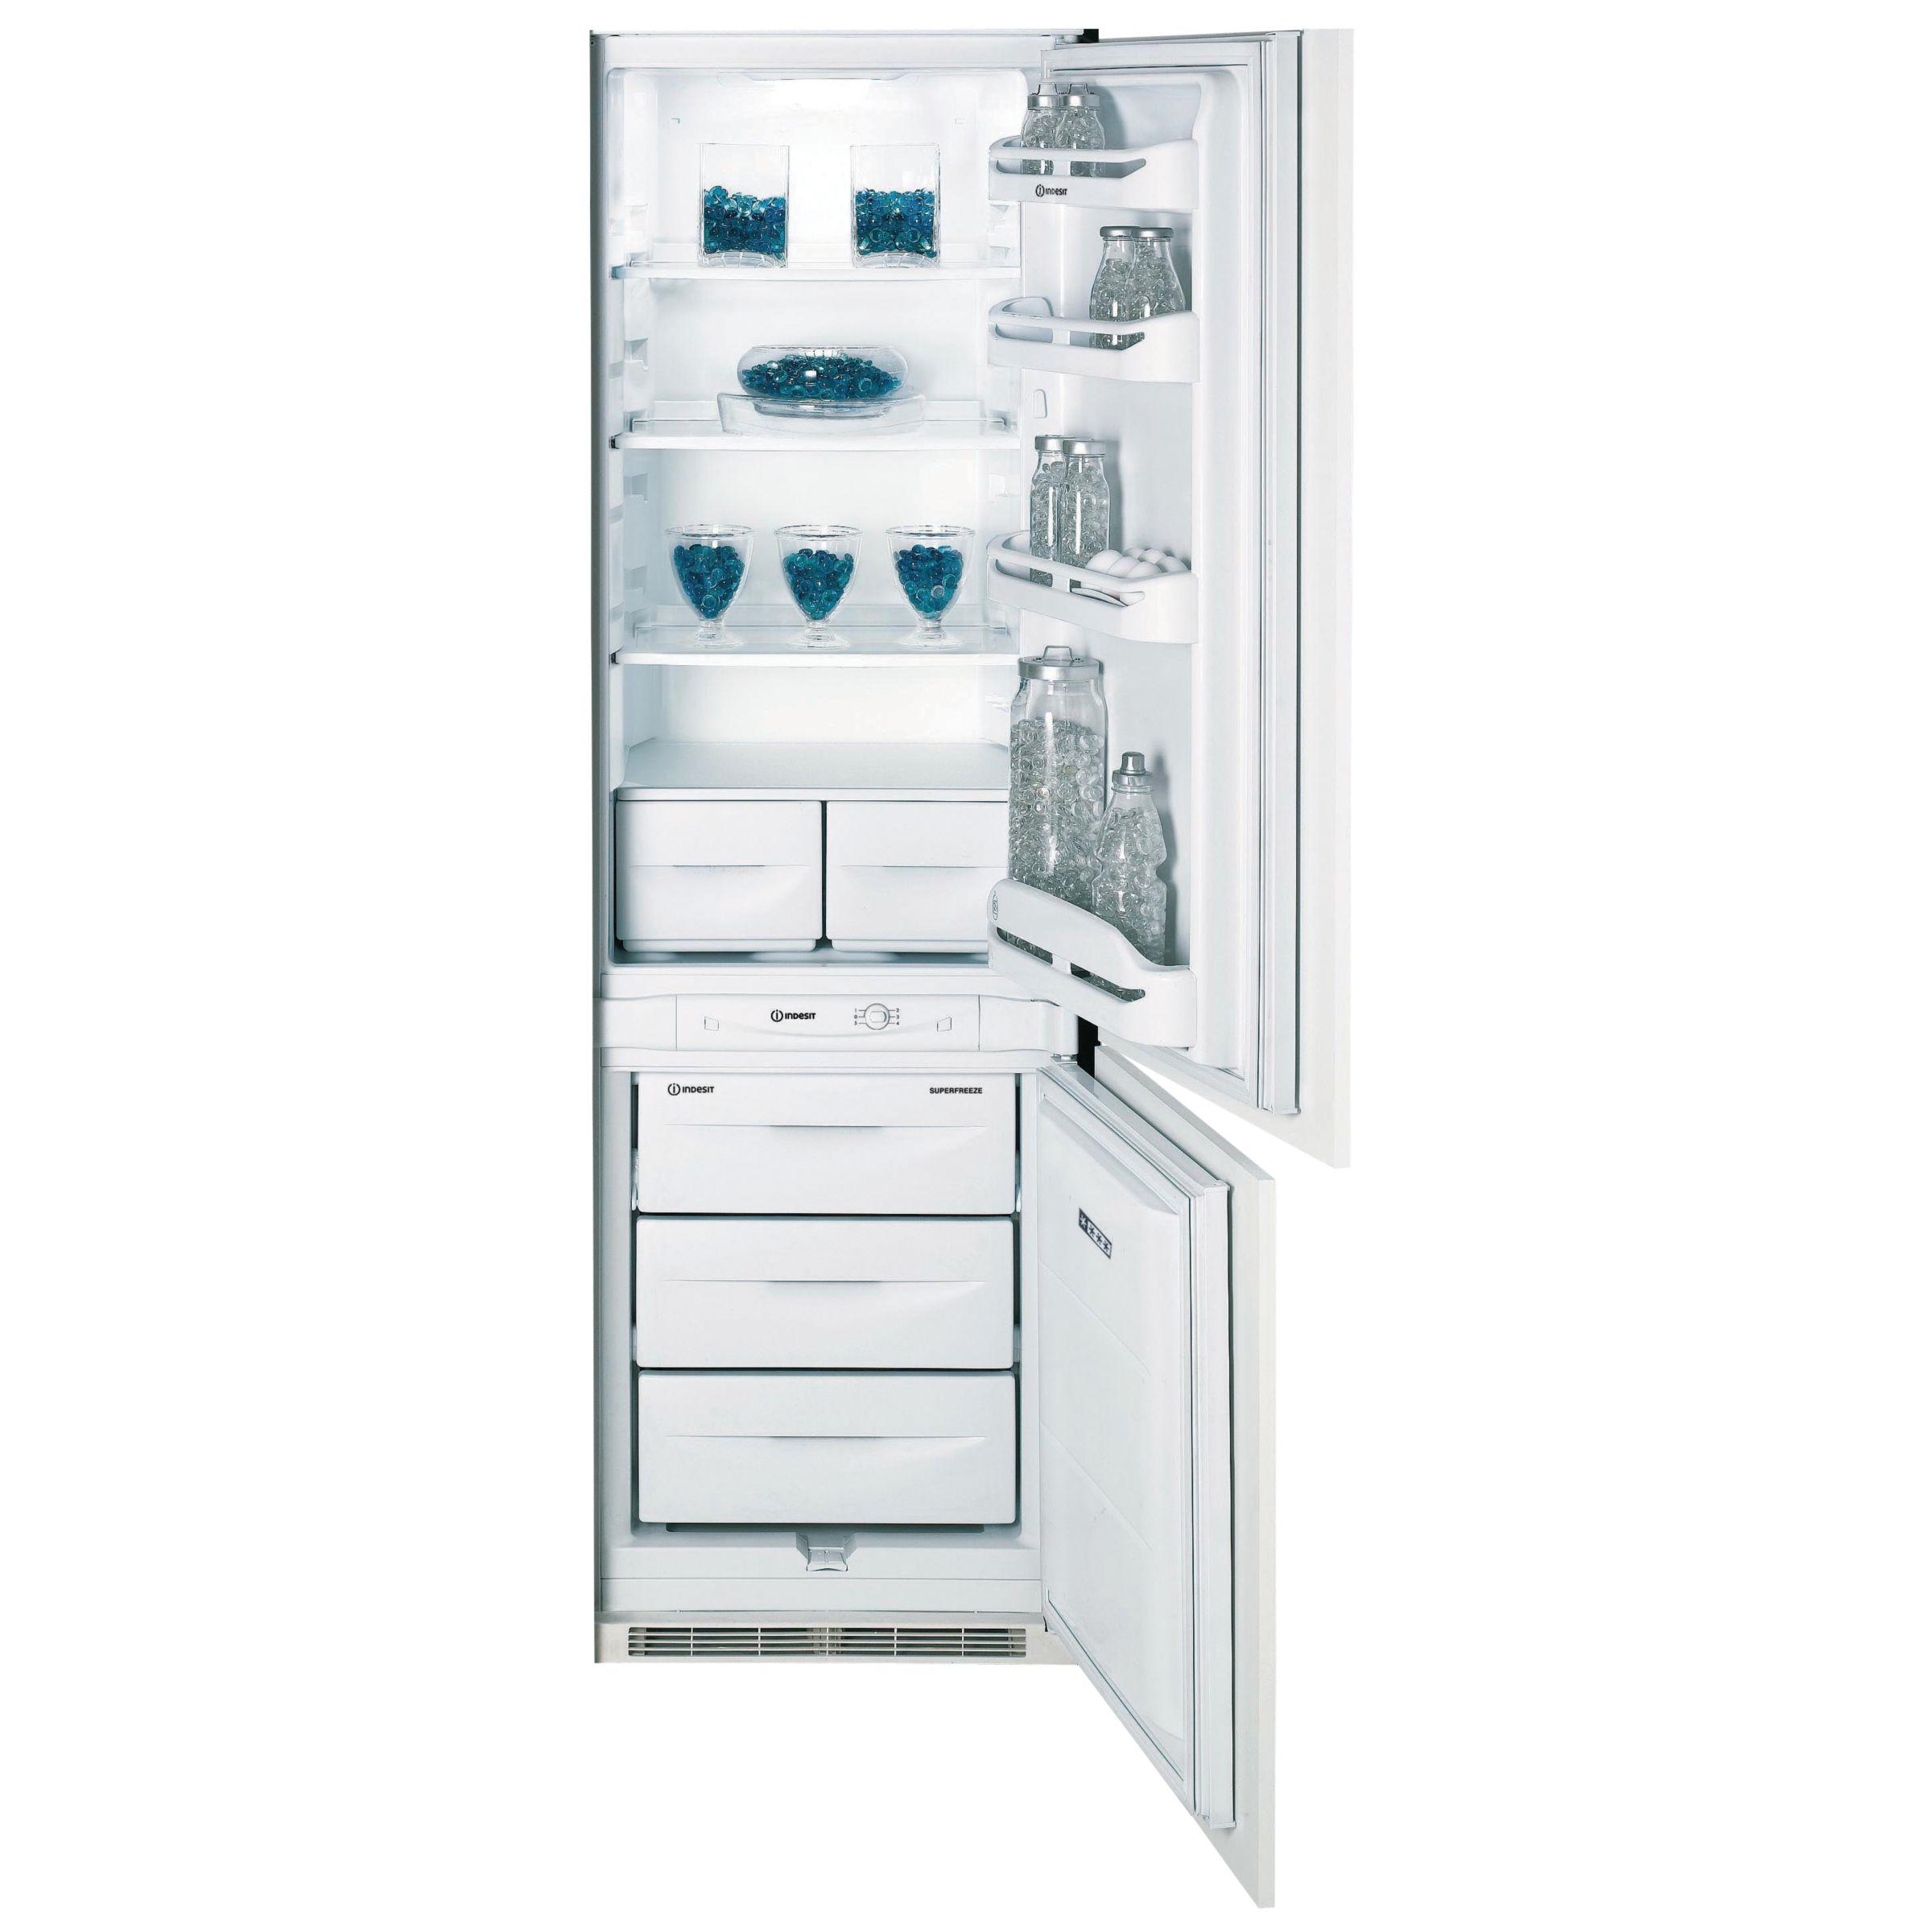 Indesit INCB320AI Integrated Fridge Freezer at John Lewis